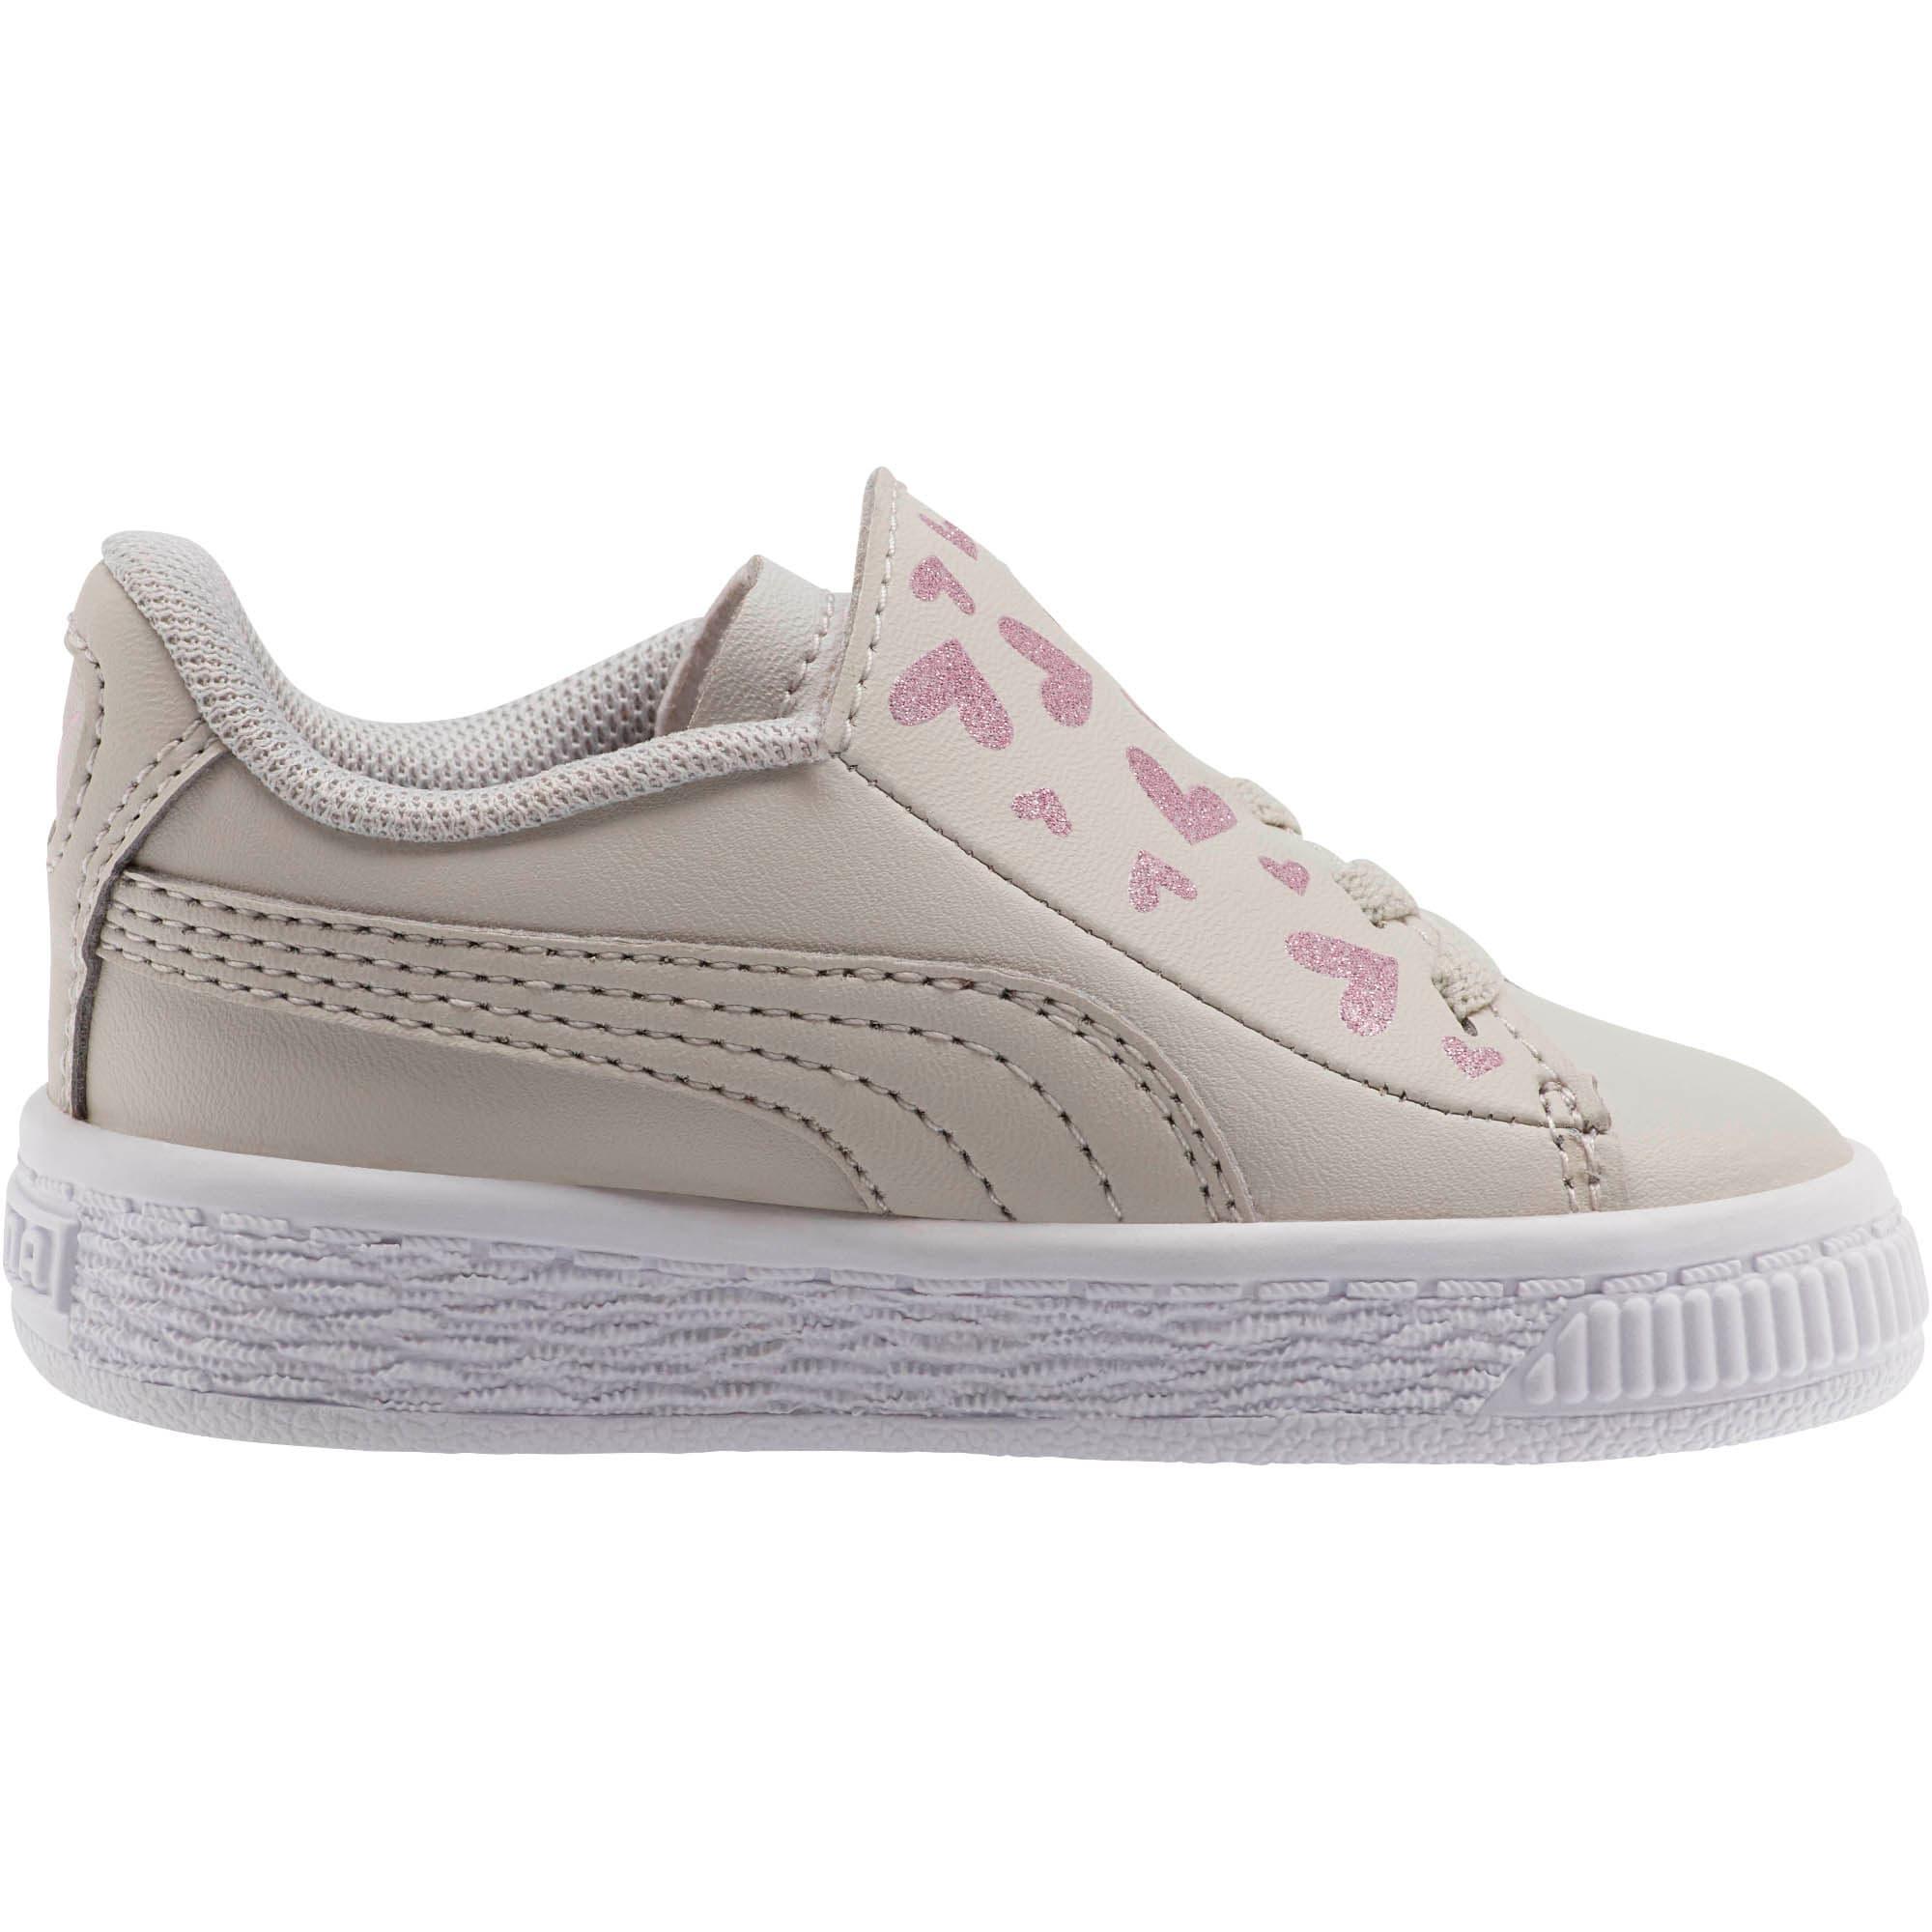 Thumbnail 4 of Basket Crush Glitter Hearts AC Toddler Shoes, Gray Violet-Puma White, medium